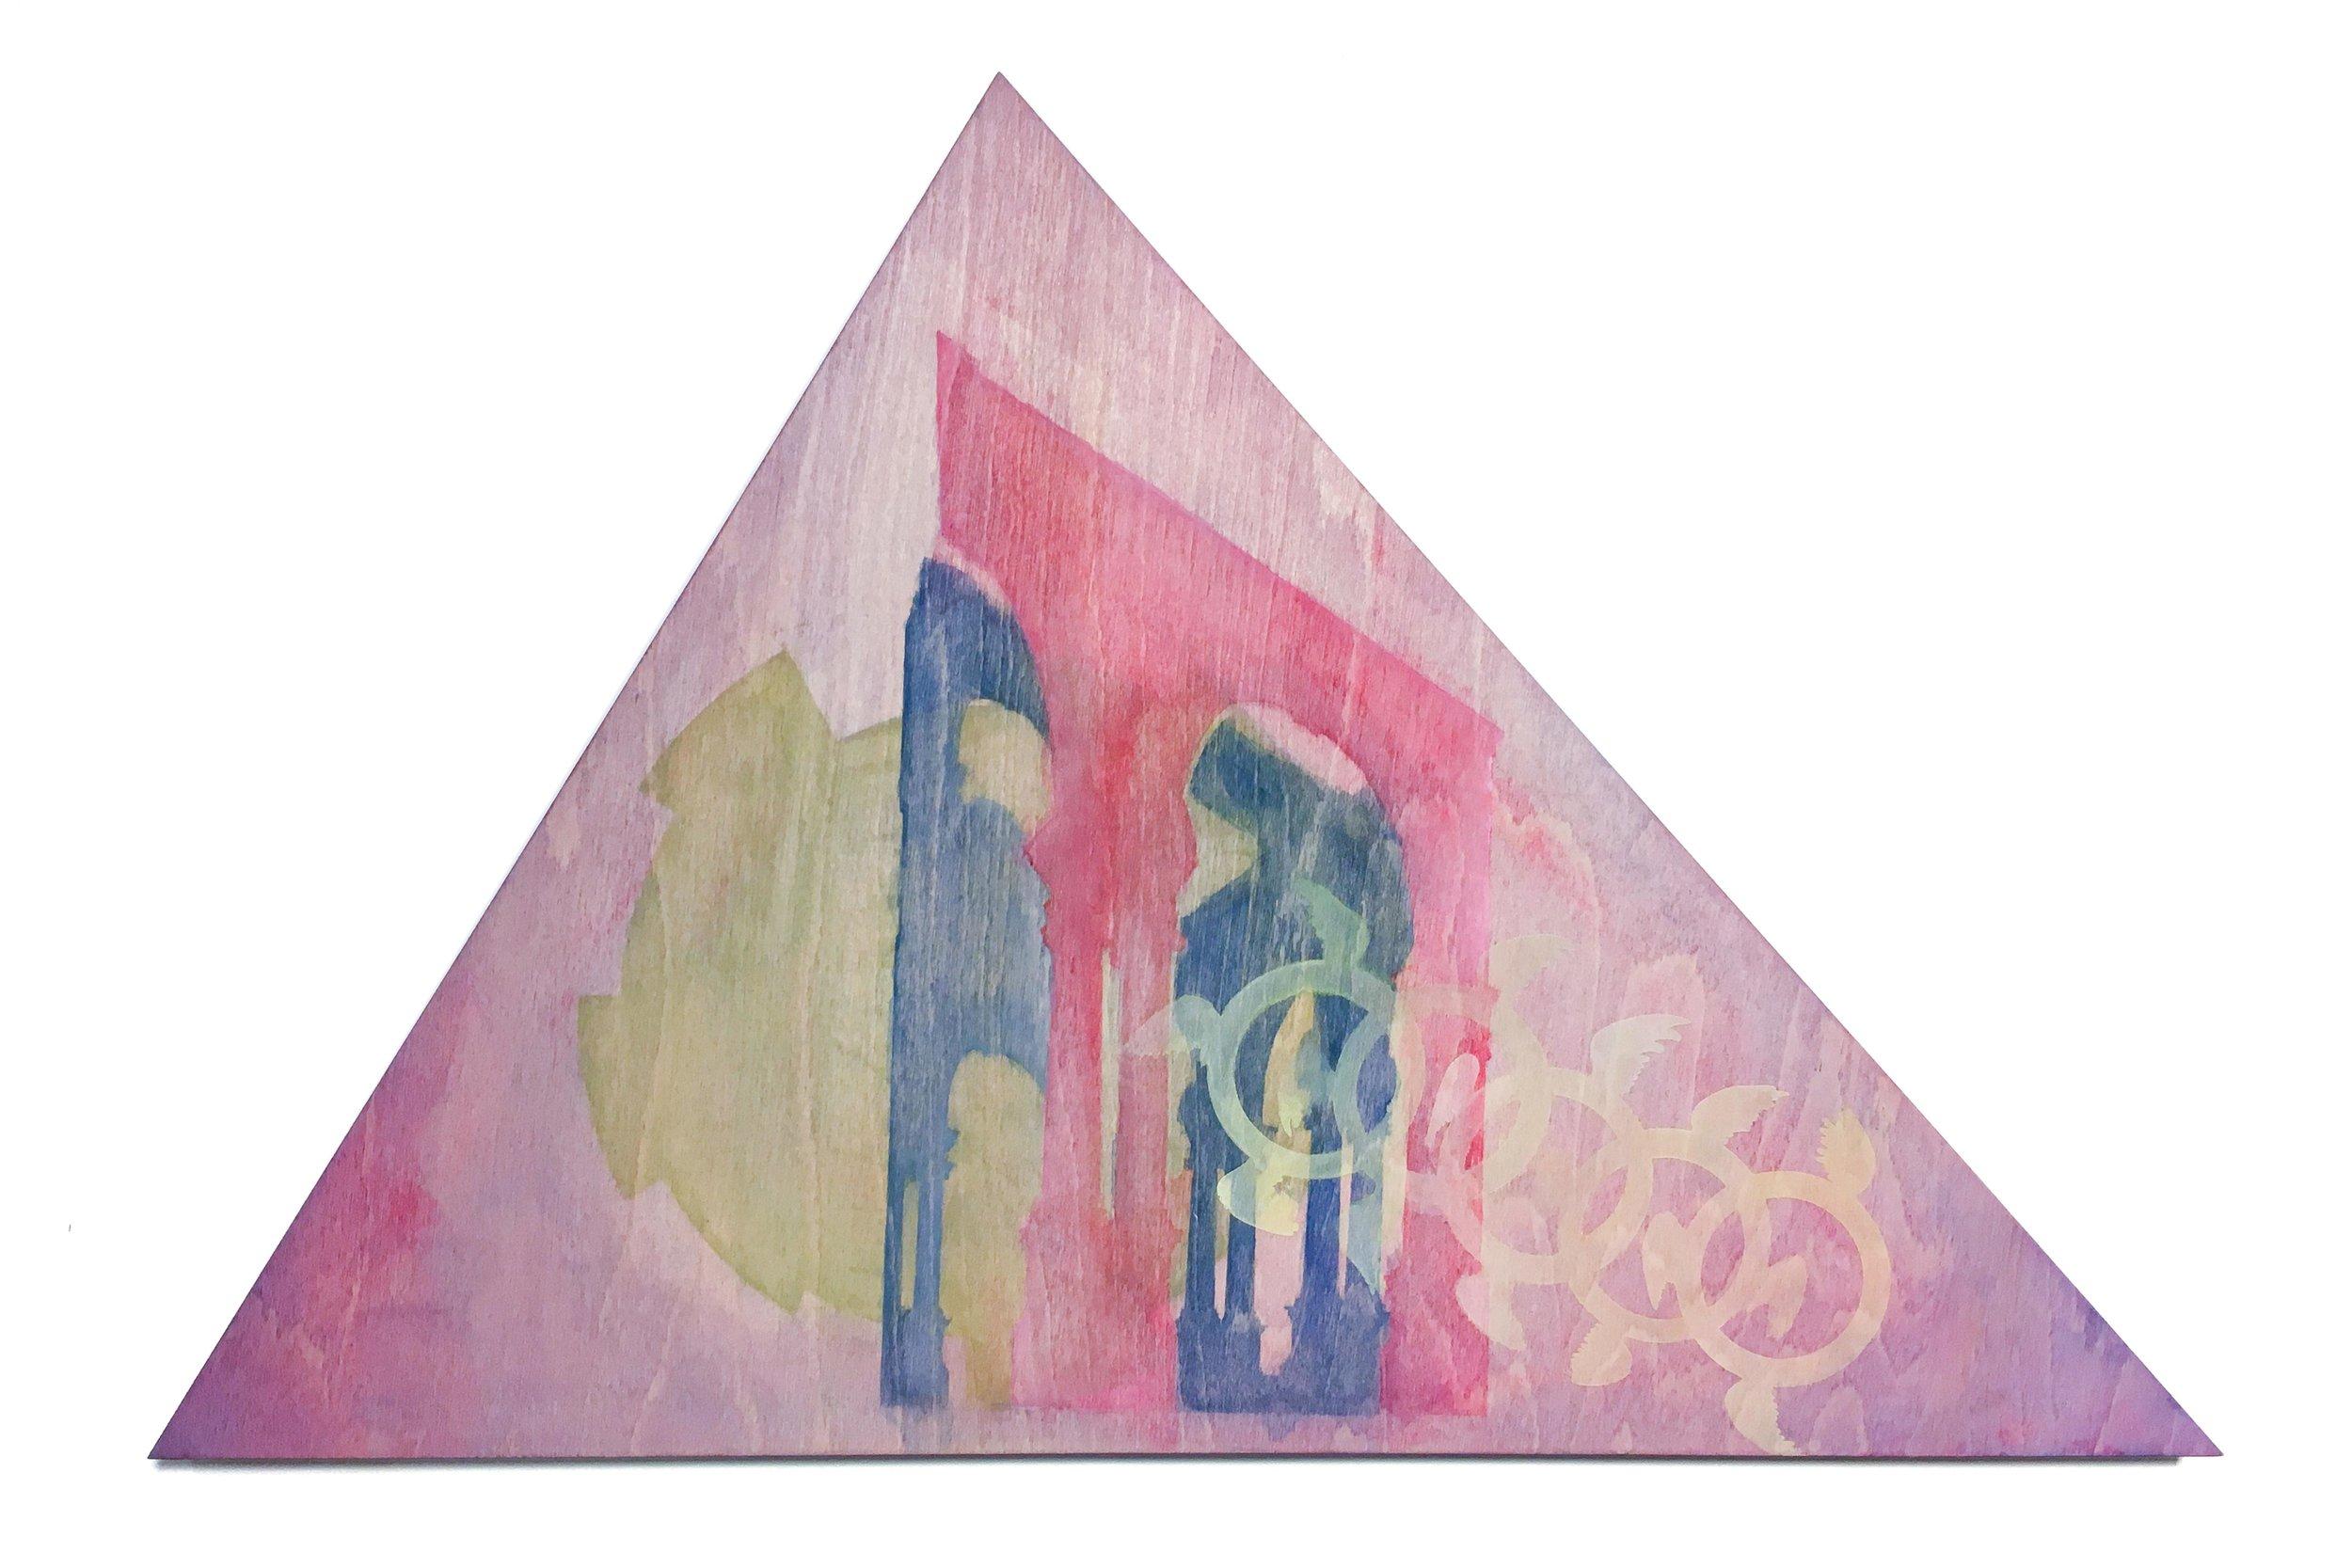 2_pink_triangle_s.jpg